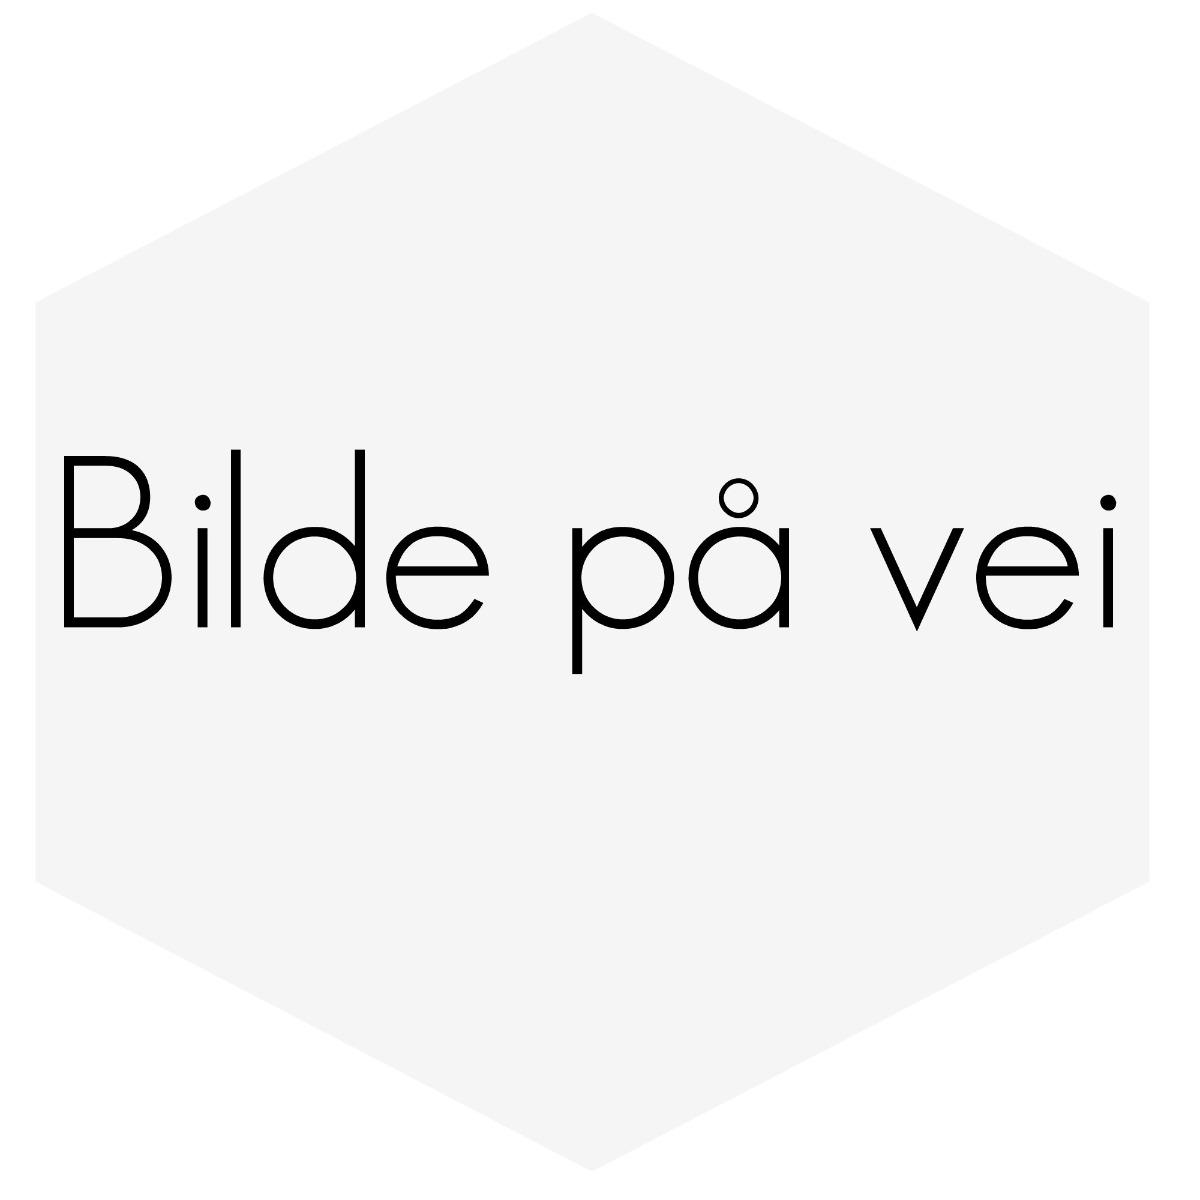 LOCKARI PLAST INNERSKJERM 850 HØYRE FORAN 9152578, 1372952